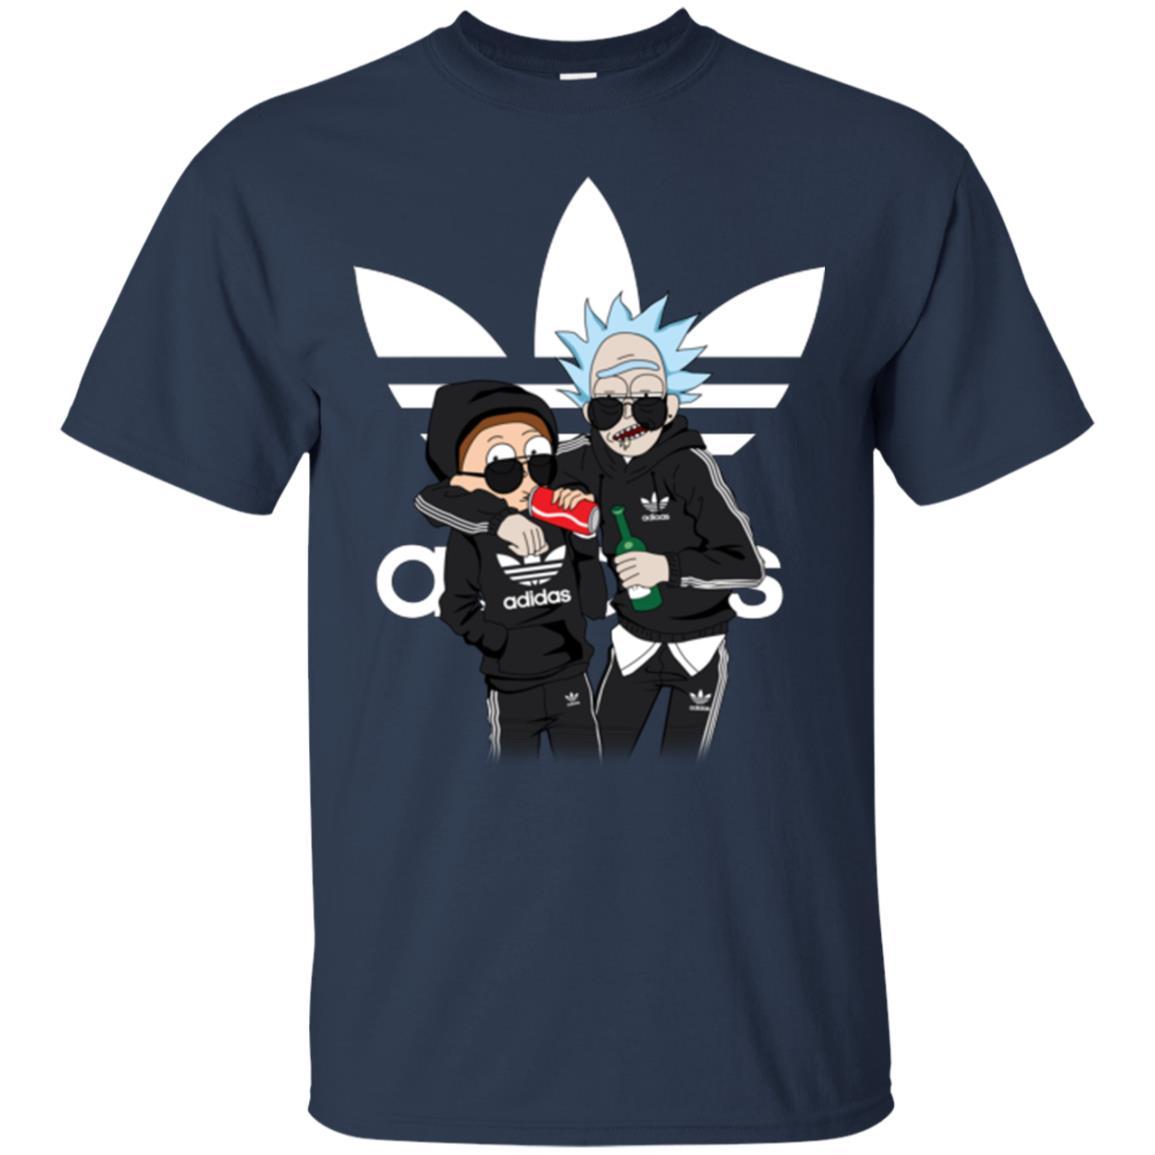 image 285px Rick and Morty Adidas Mashup T Shirt, Hoodies, Tank Top